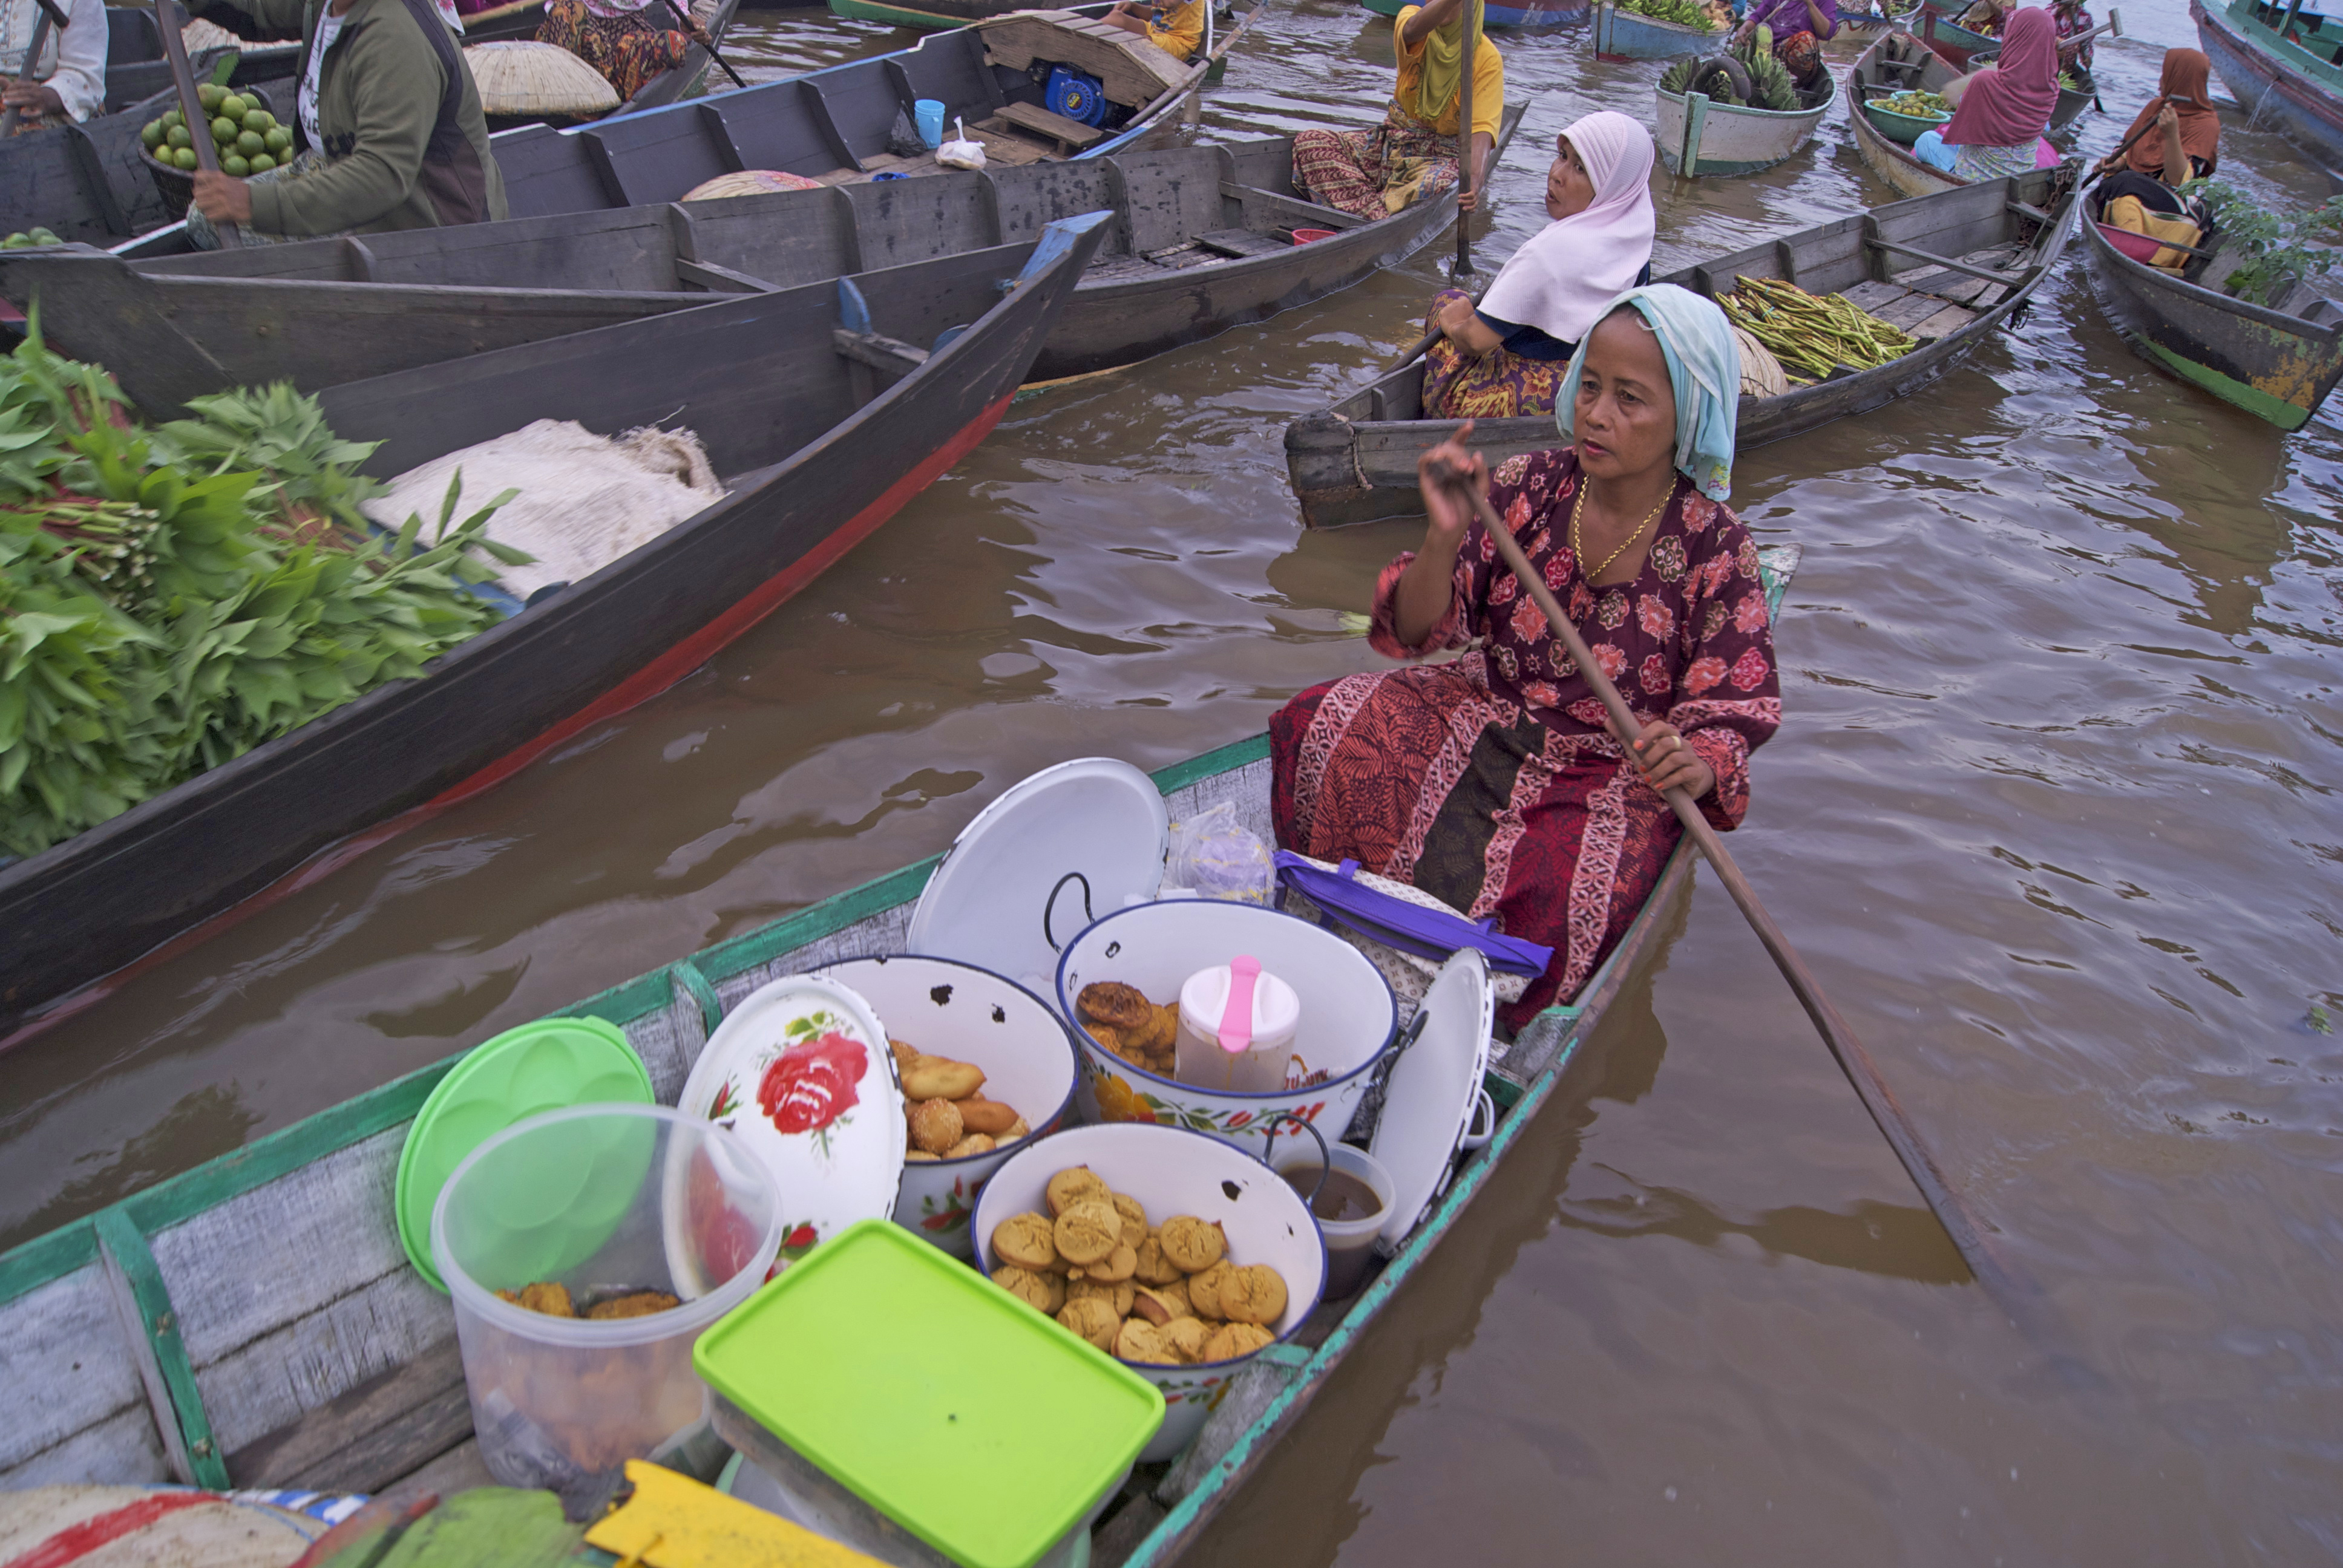 File Pasar Terapung Lok Baintan Penjual Kue Jpg Wikimedia Commons